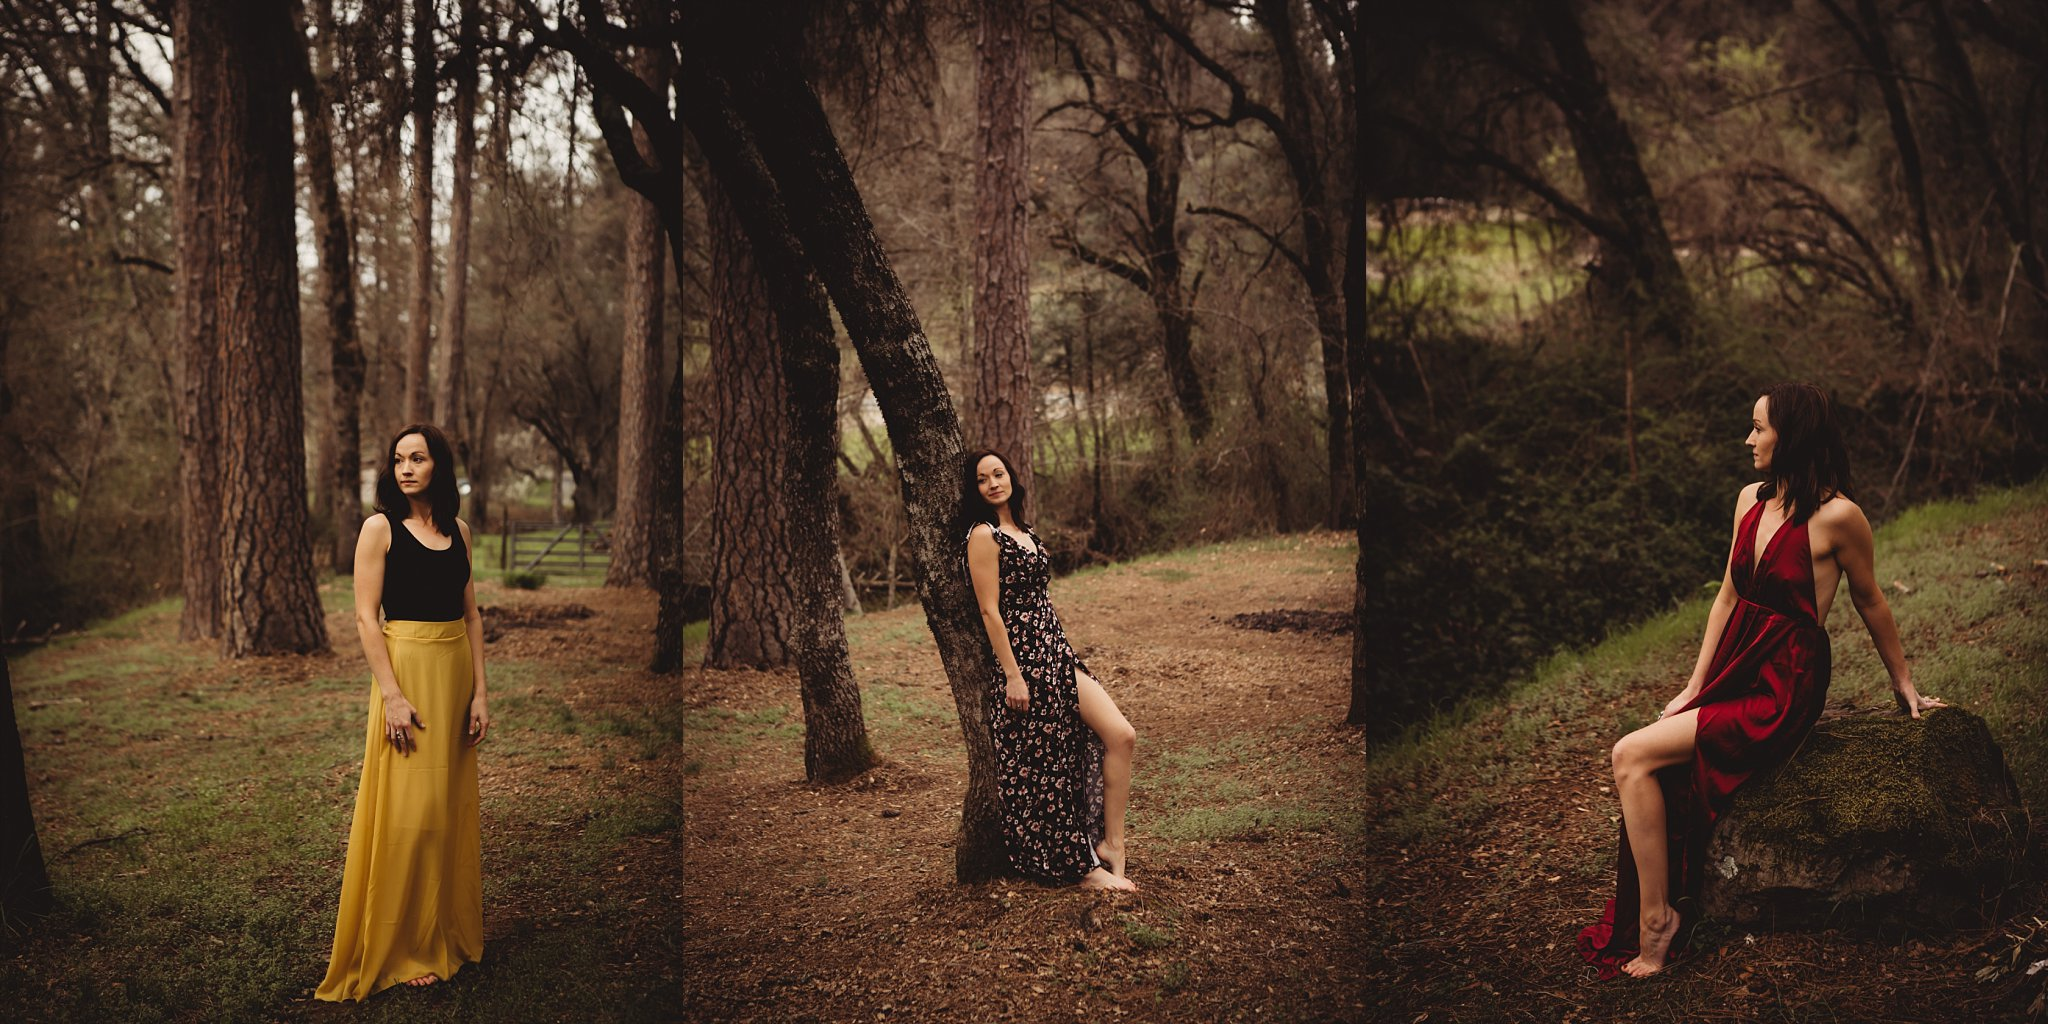 Women in dresses in woods